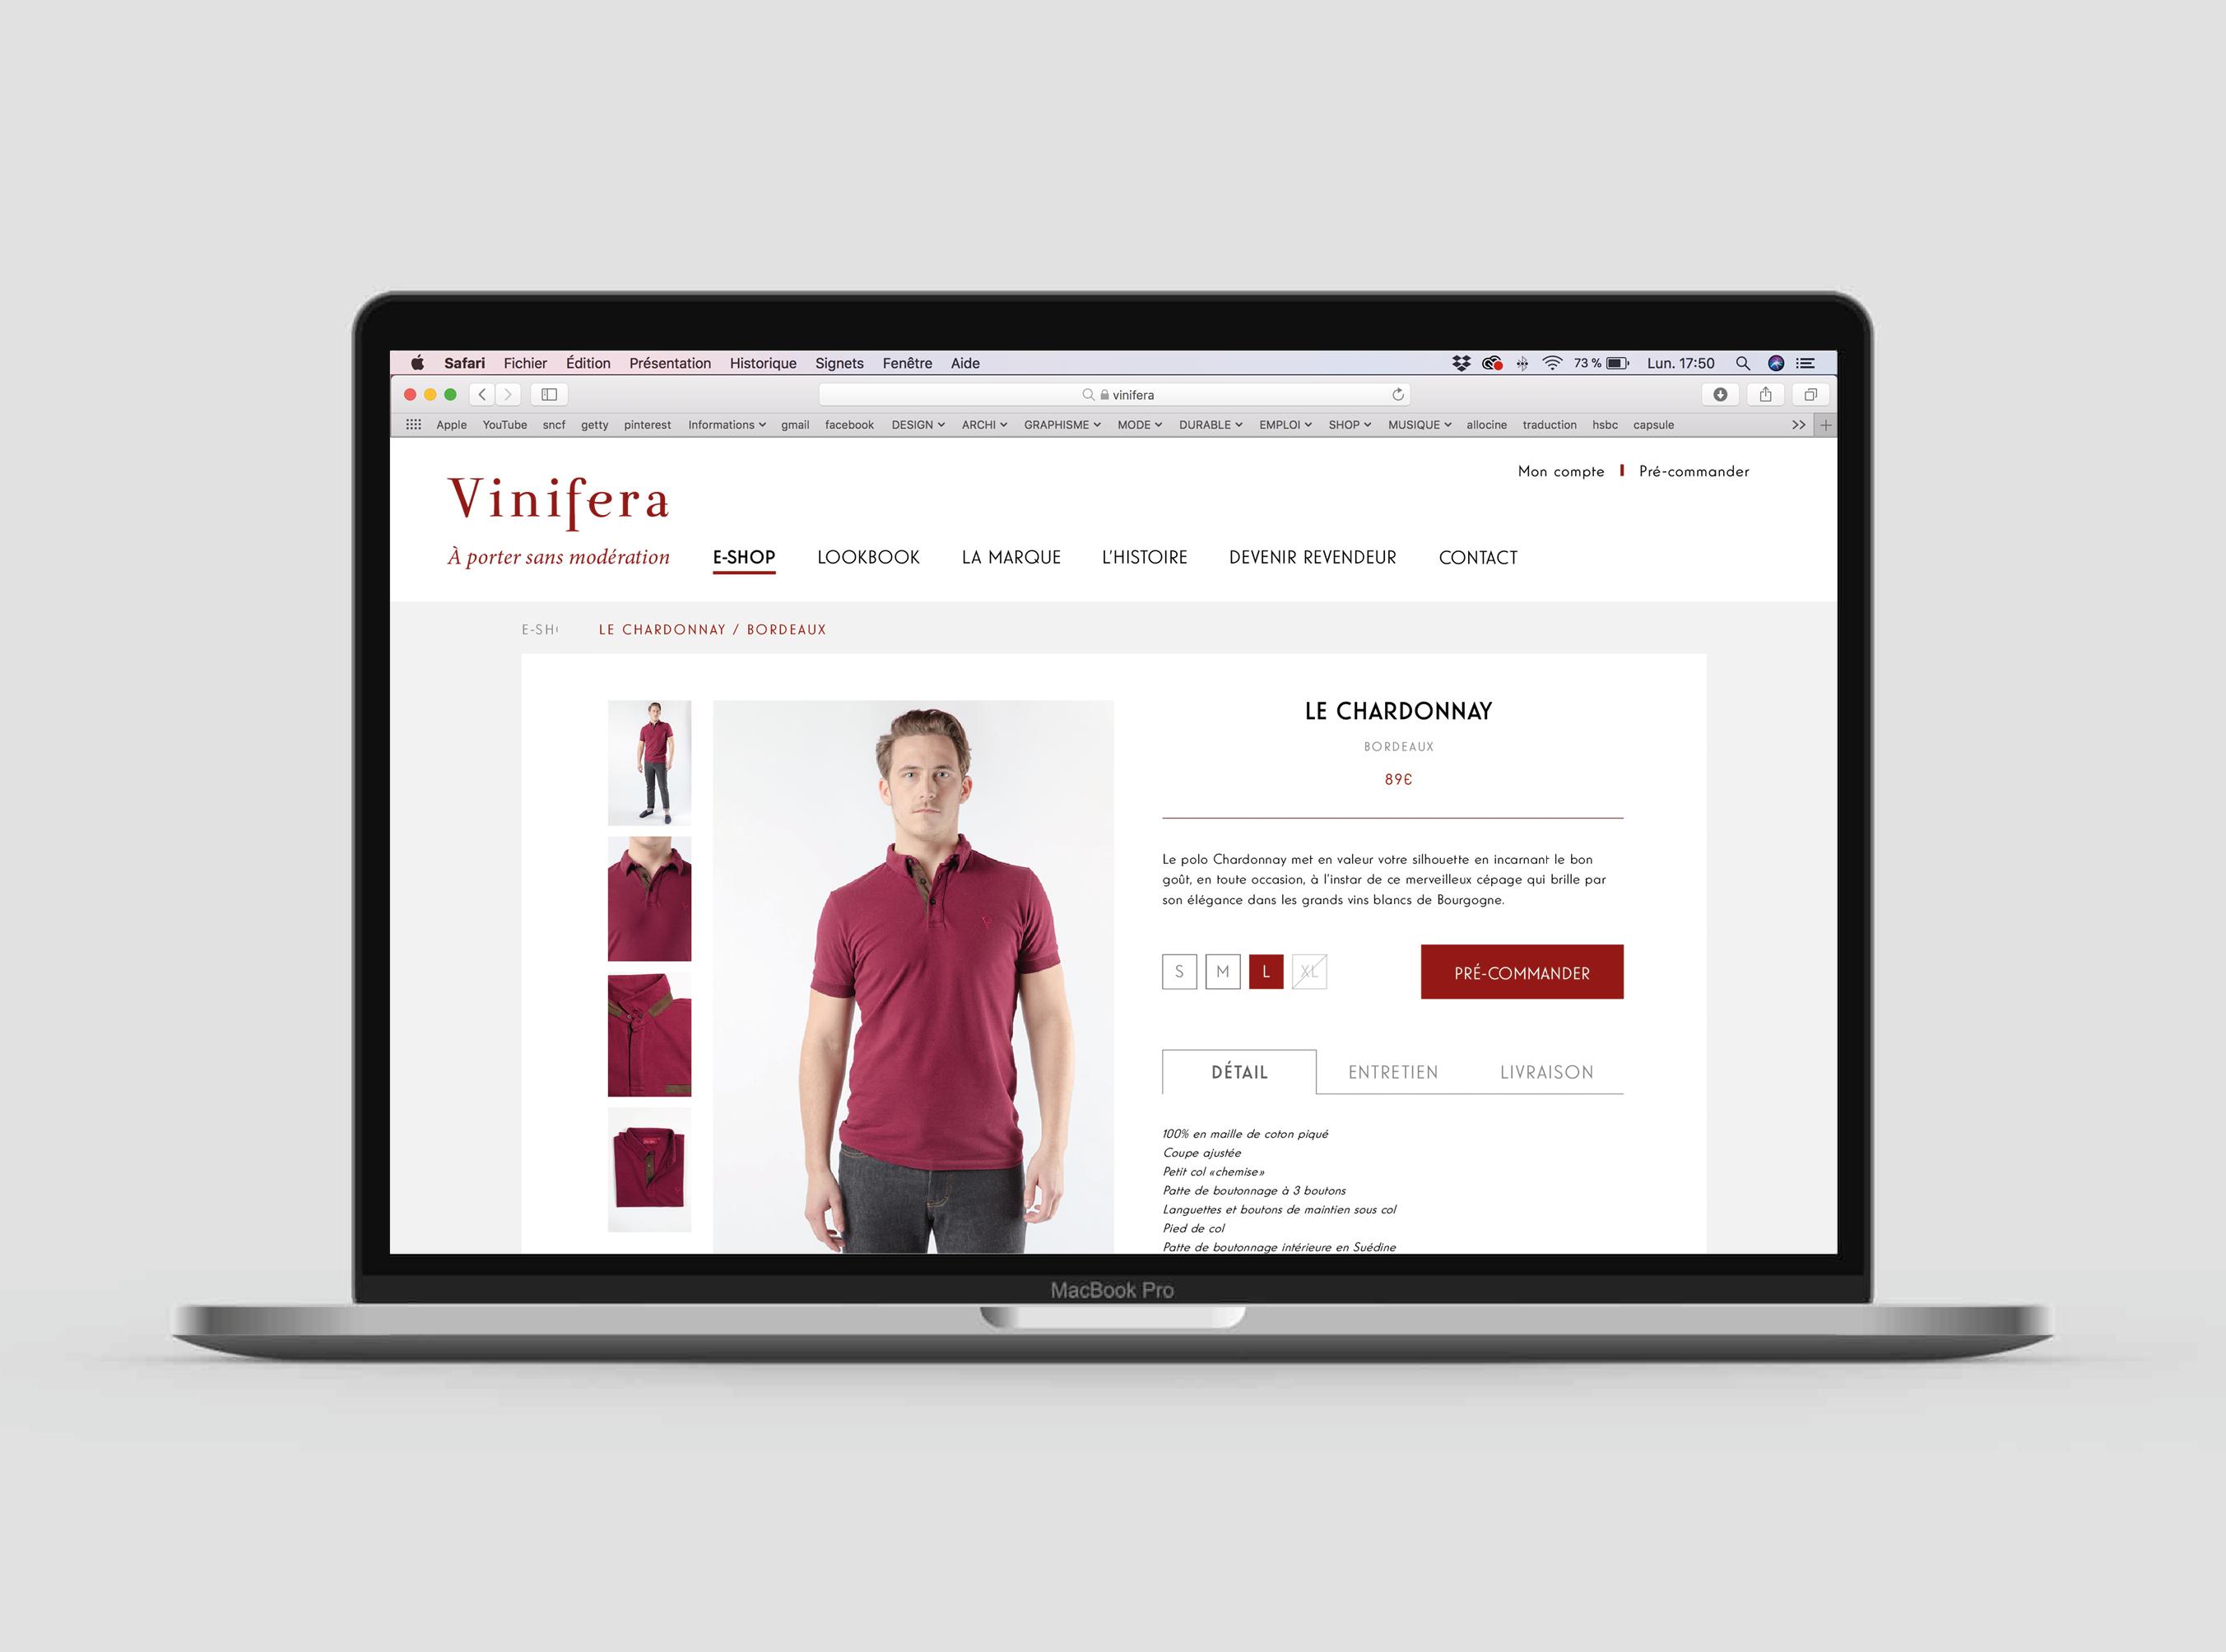 site web vinifera3